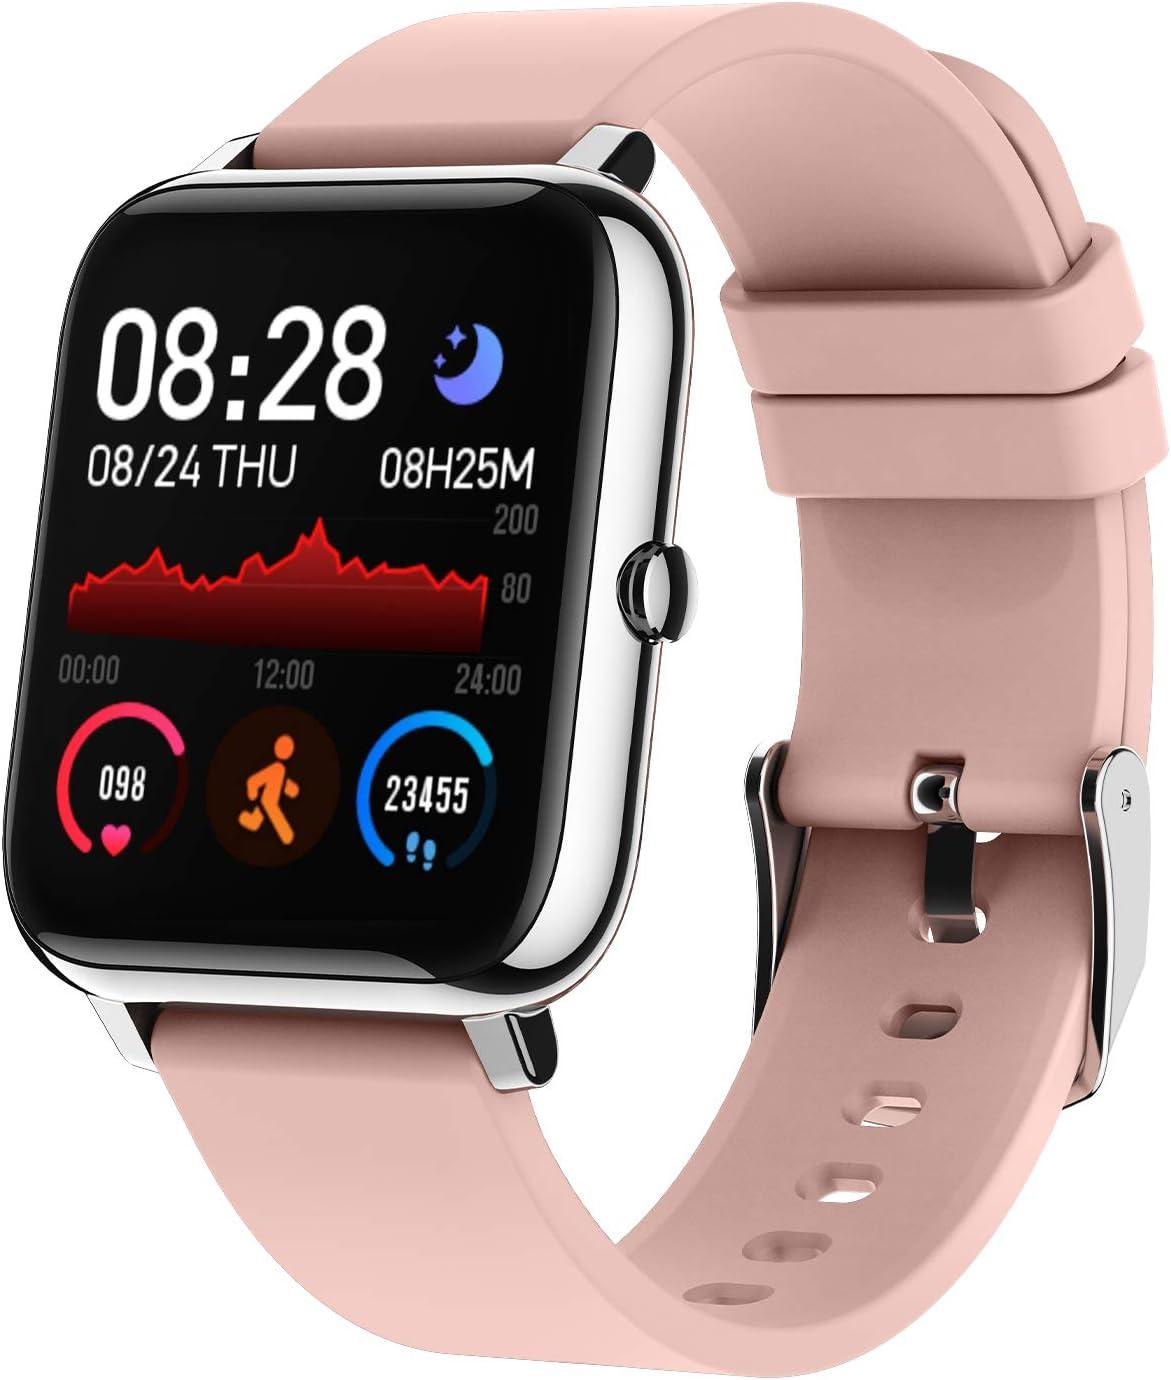 BOZLUN Smartwatch, Reloj Inteligente Impermeable IP67 para Hombre Mujer Niños,Monitor de Sueño Pulsómetros Cronómetros Contador de Caloría,1.4 Inch Pantalla Táctil Smartwatch para Android iOS(Rosado)